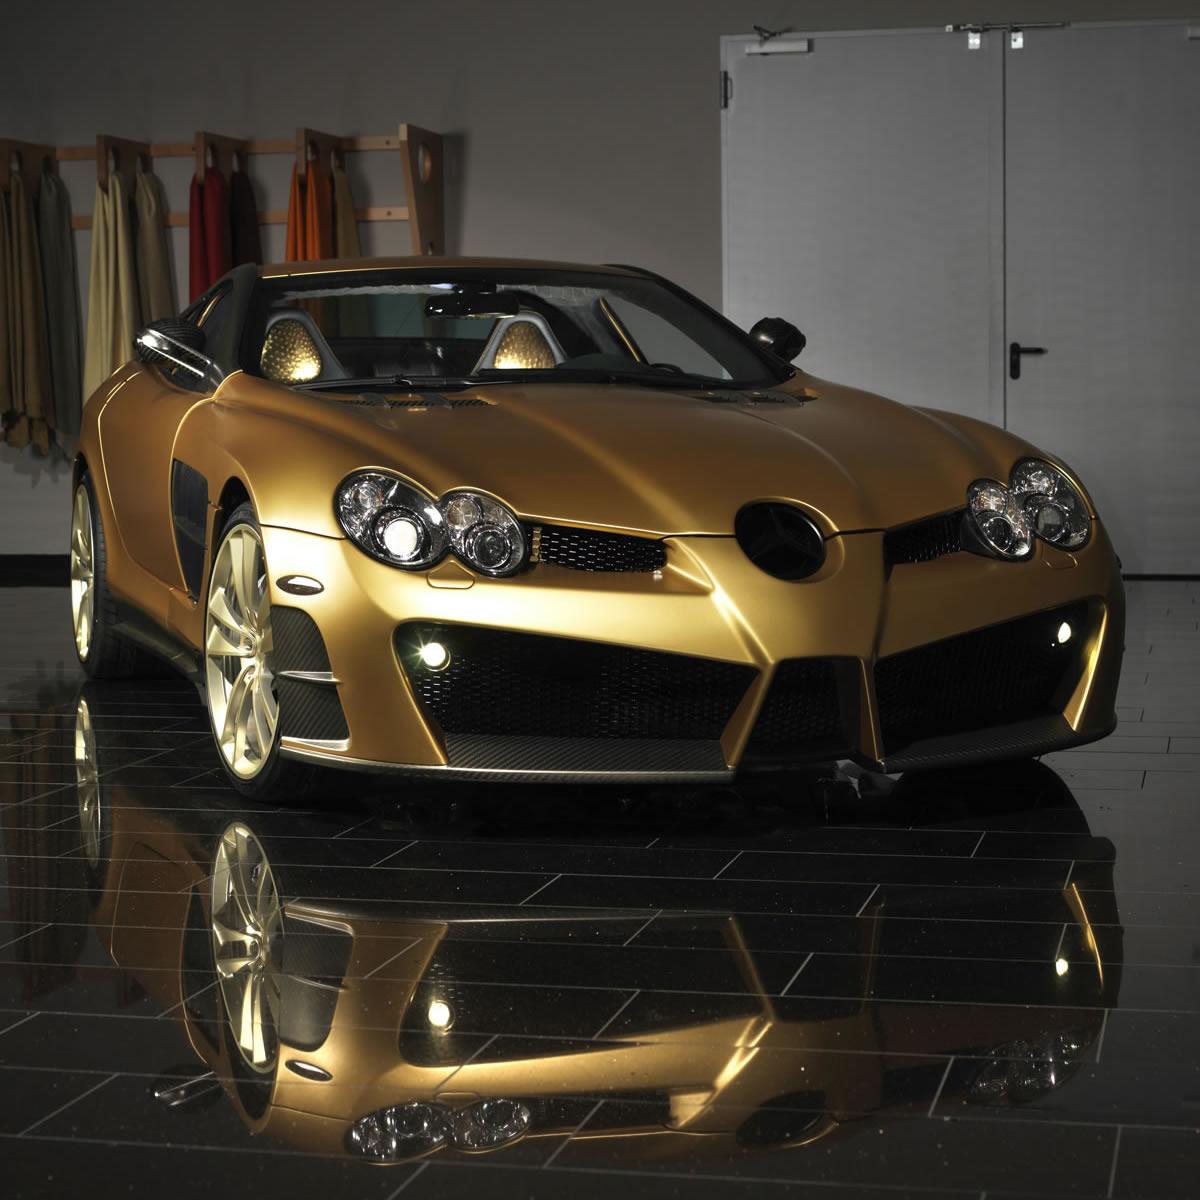 Was ist euer Lieblings Auto ?  - Seite 2 Mercedes_benz_slr_mclaren_renovatio_gold_edition